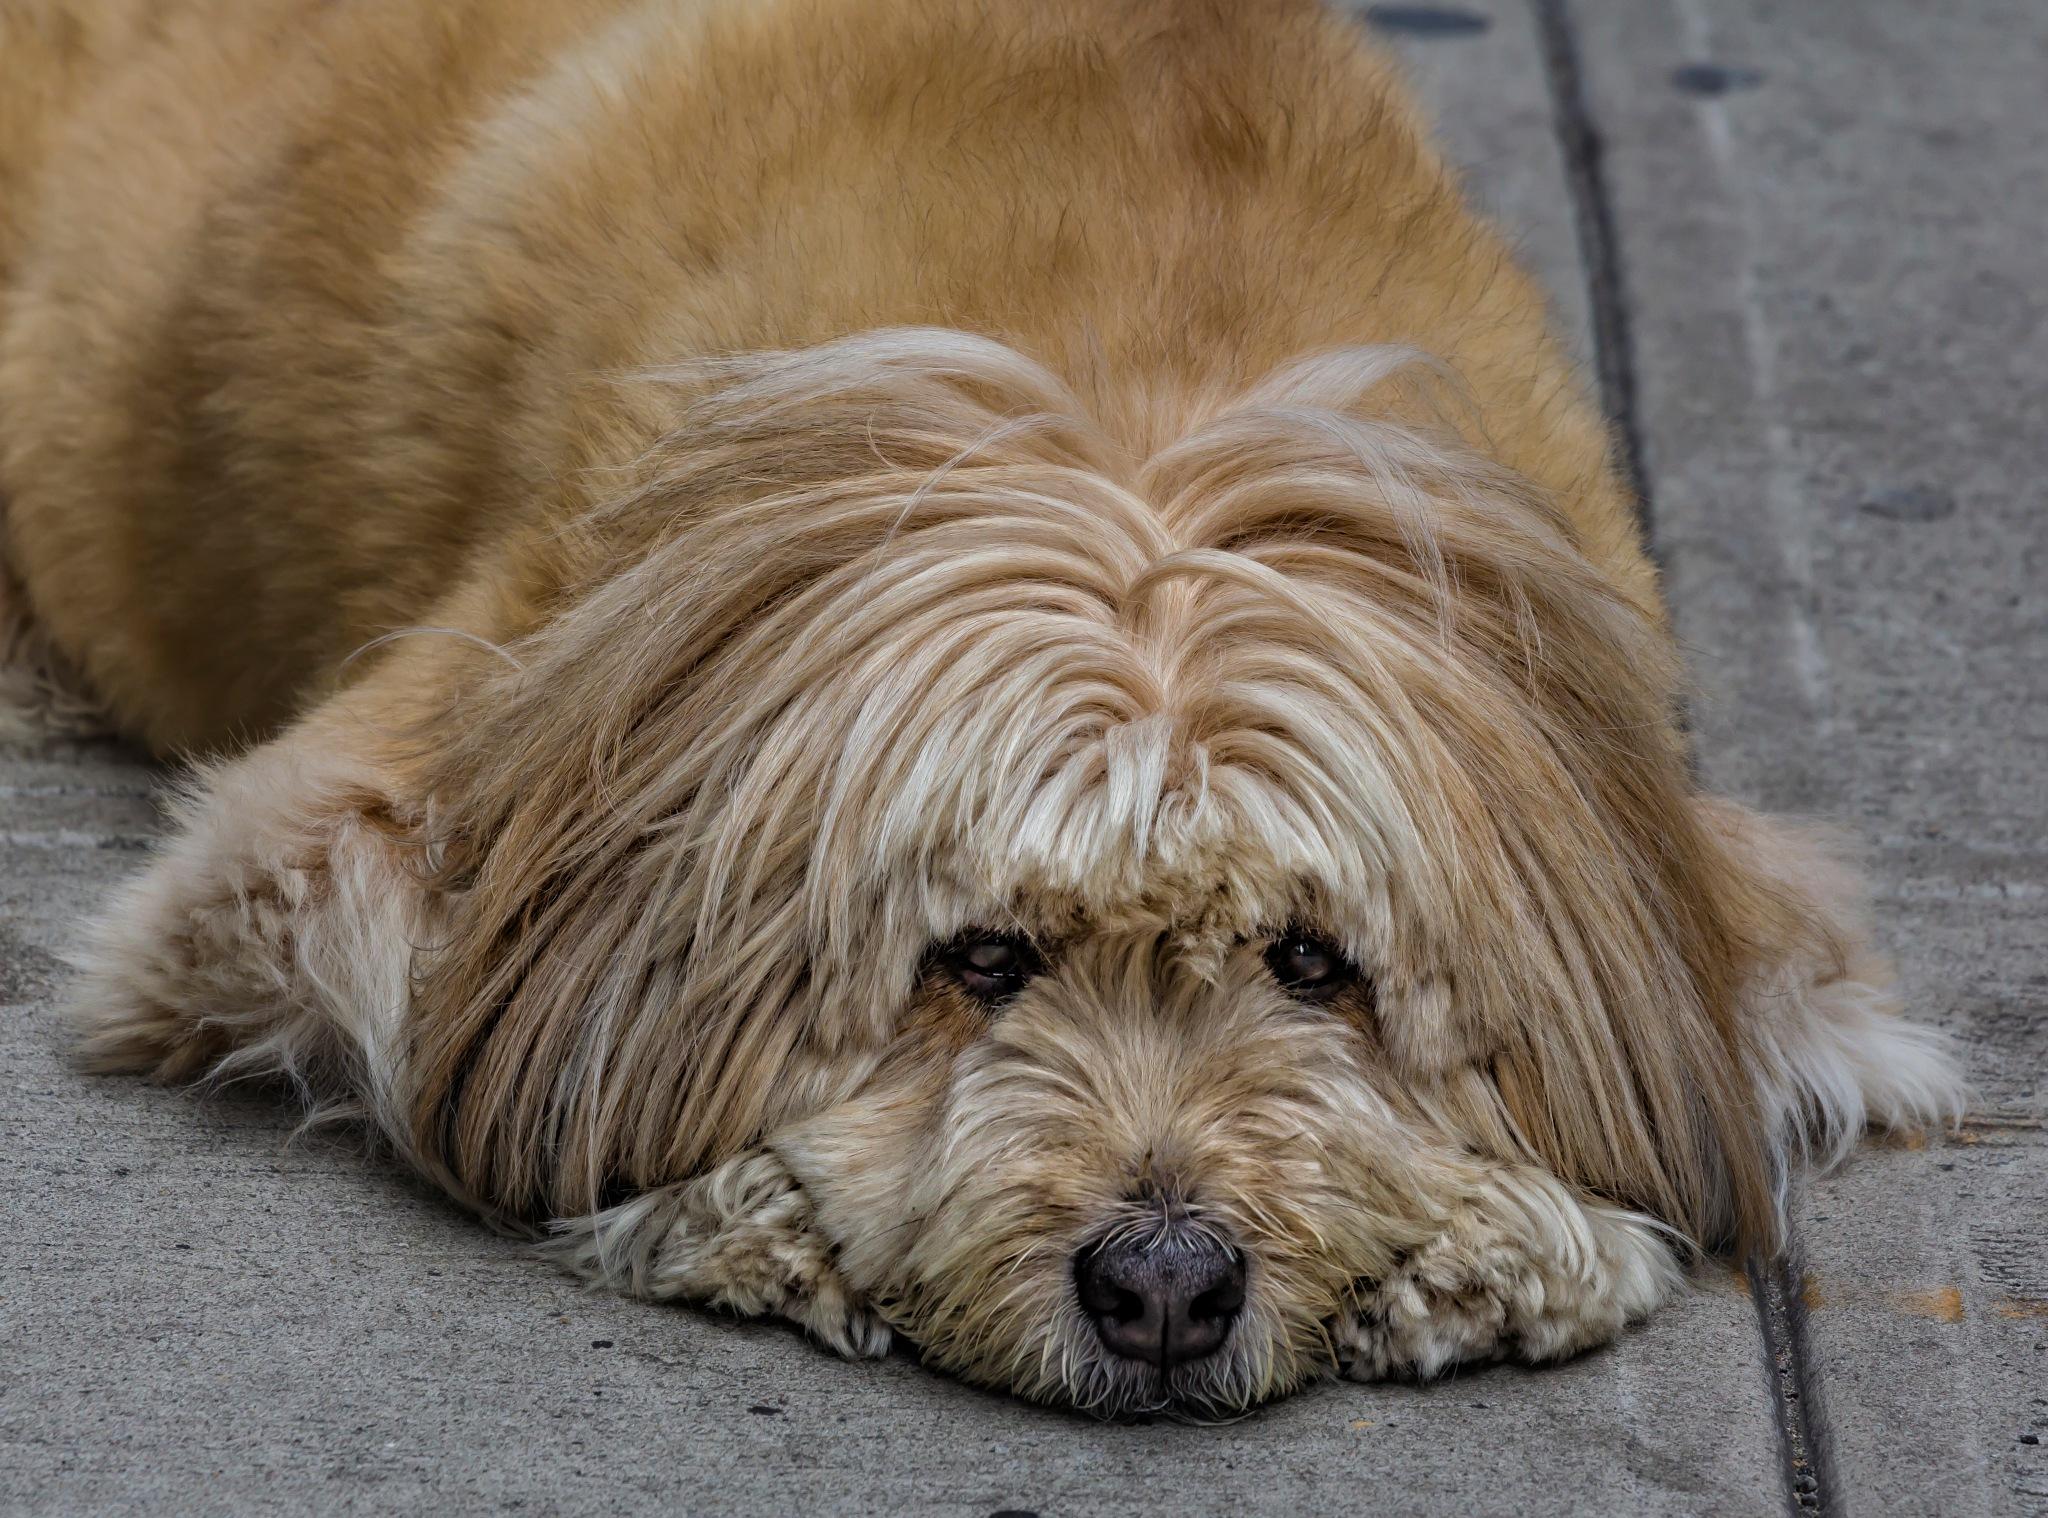 Dog at Rest by robertullmann